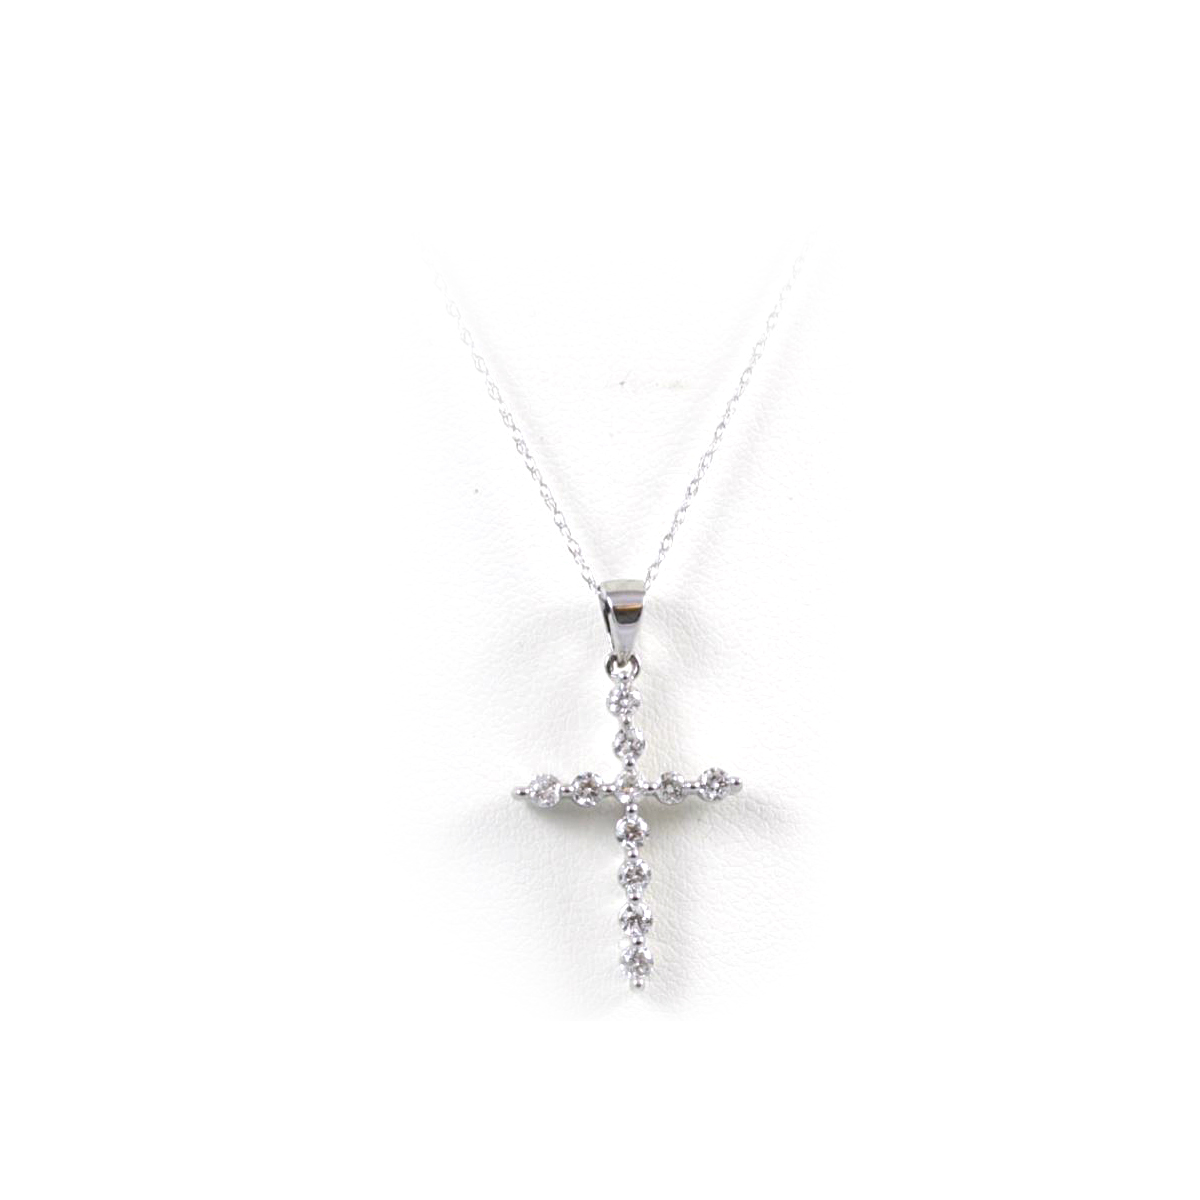 14 Karat White Gold Diamond Cross Pendant Necklace